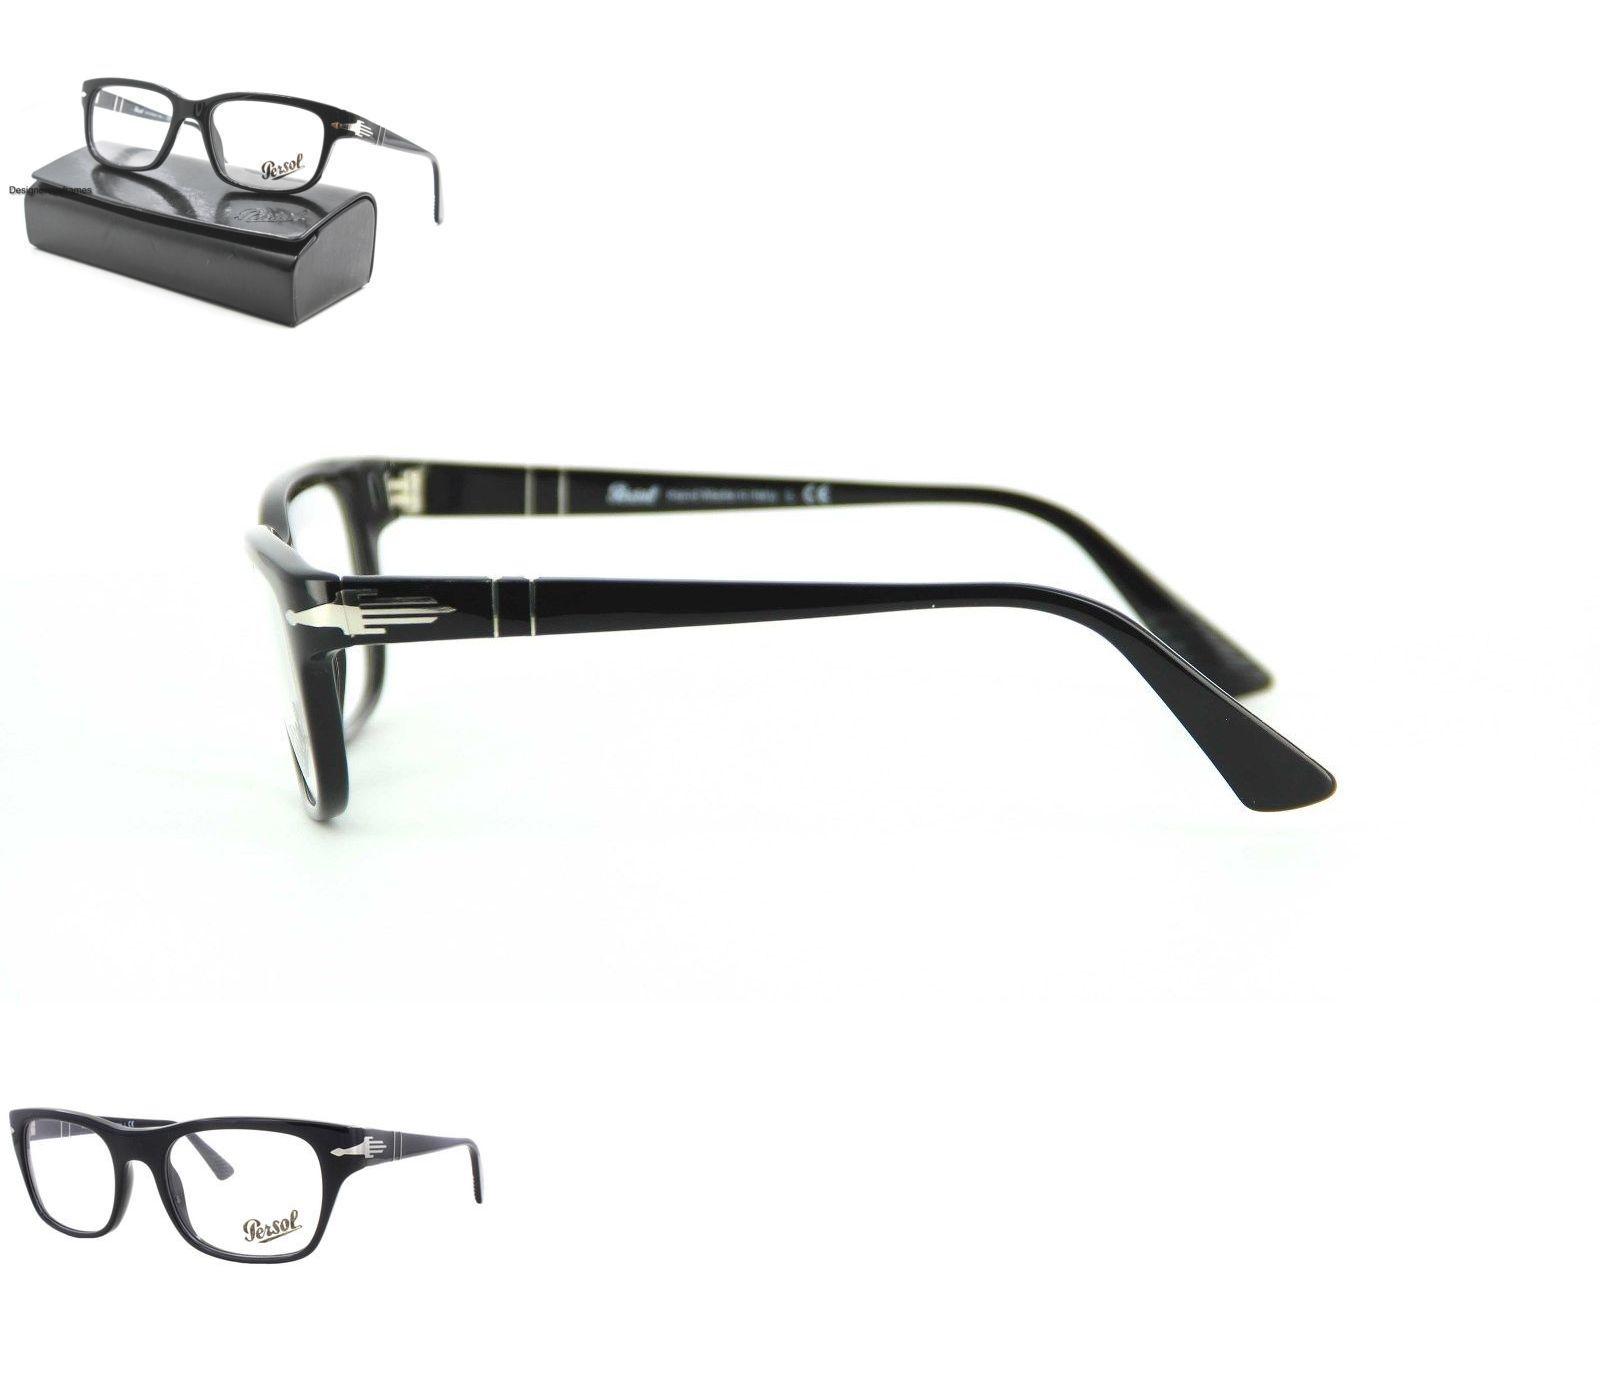 Fashion Eyewear Clear Glasses 179244: Persol 3073V 95 Shiny Black ...